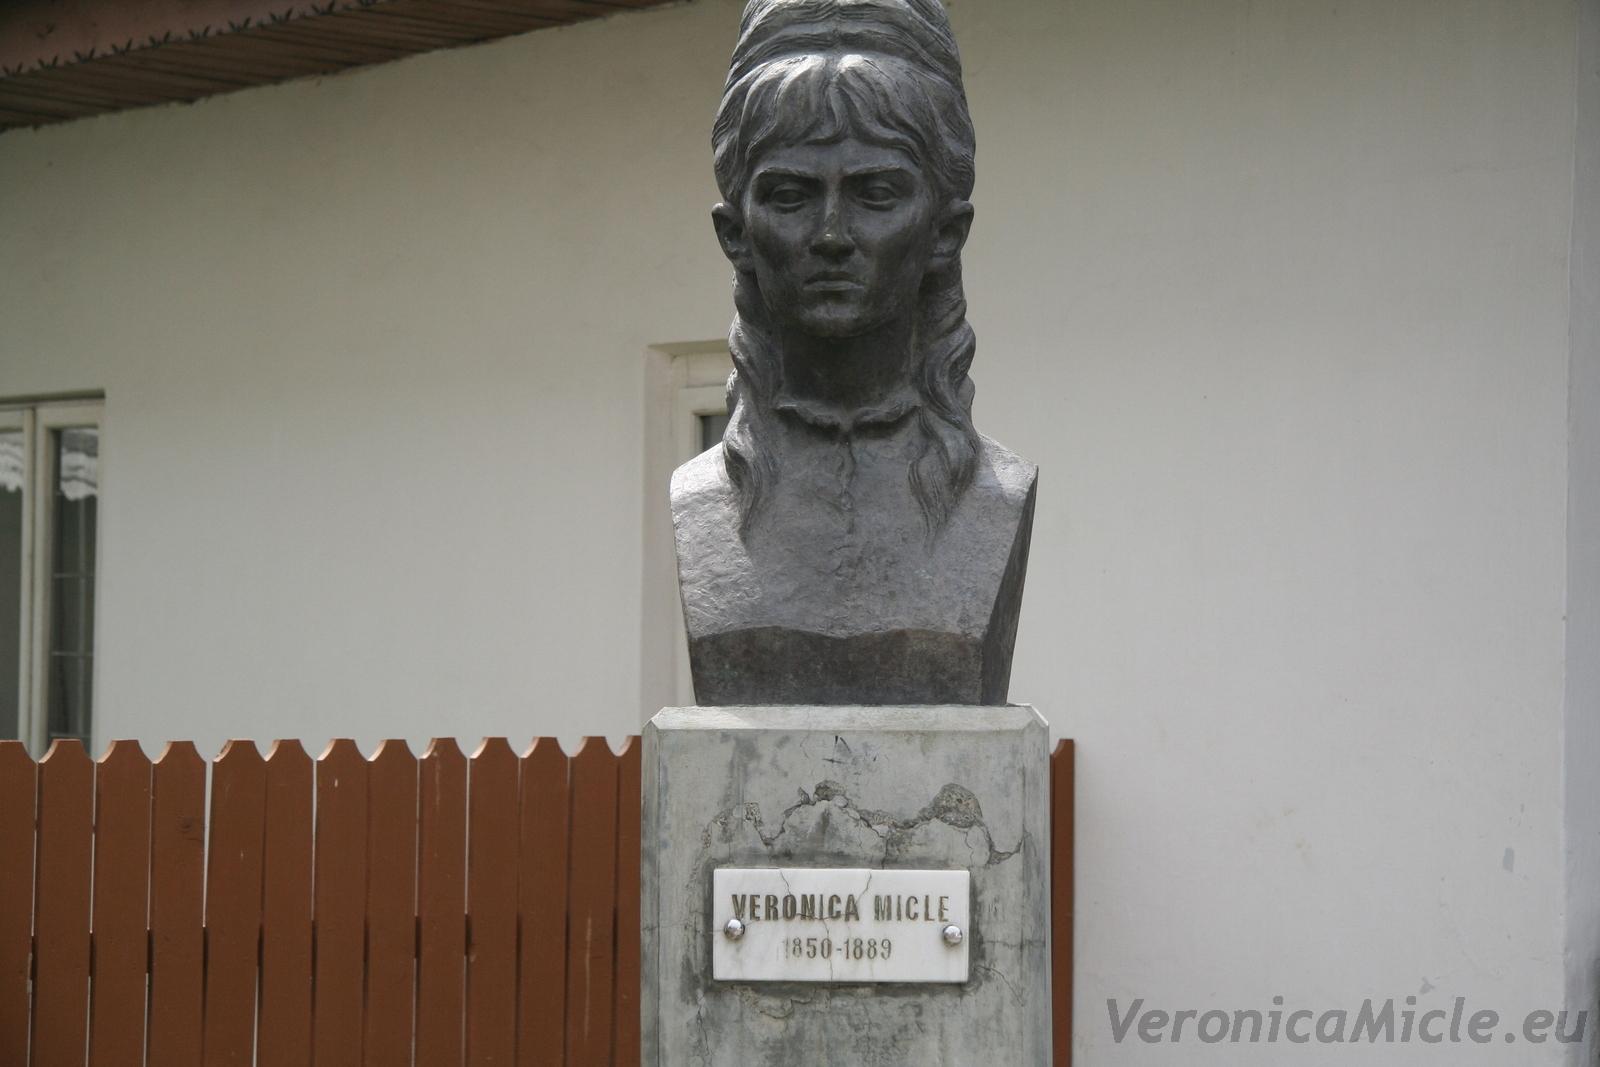 Veronica Miclea1